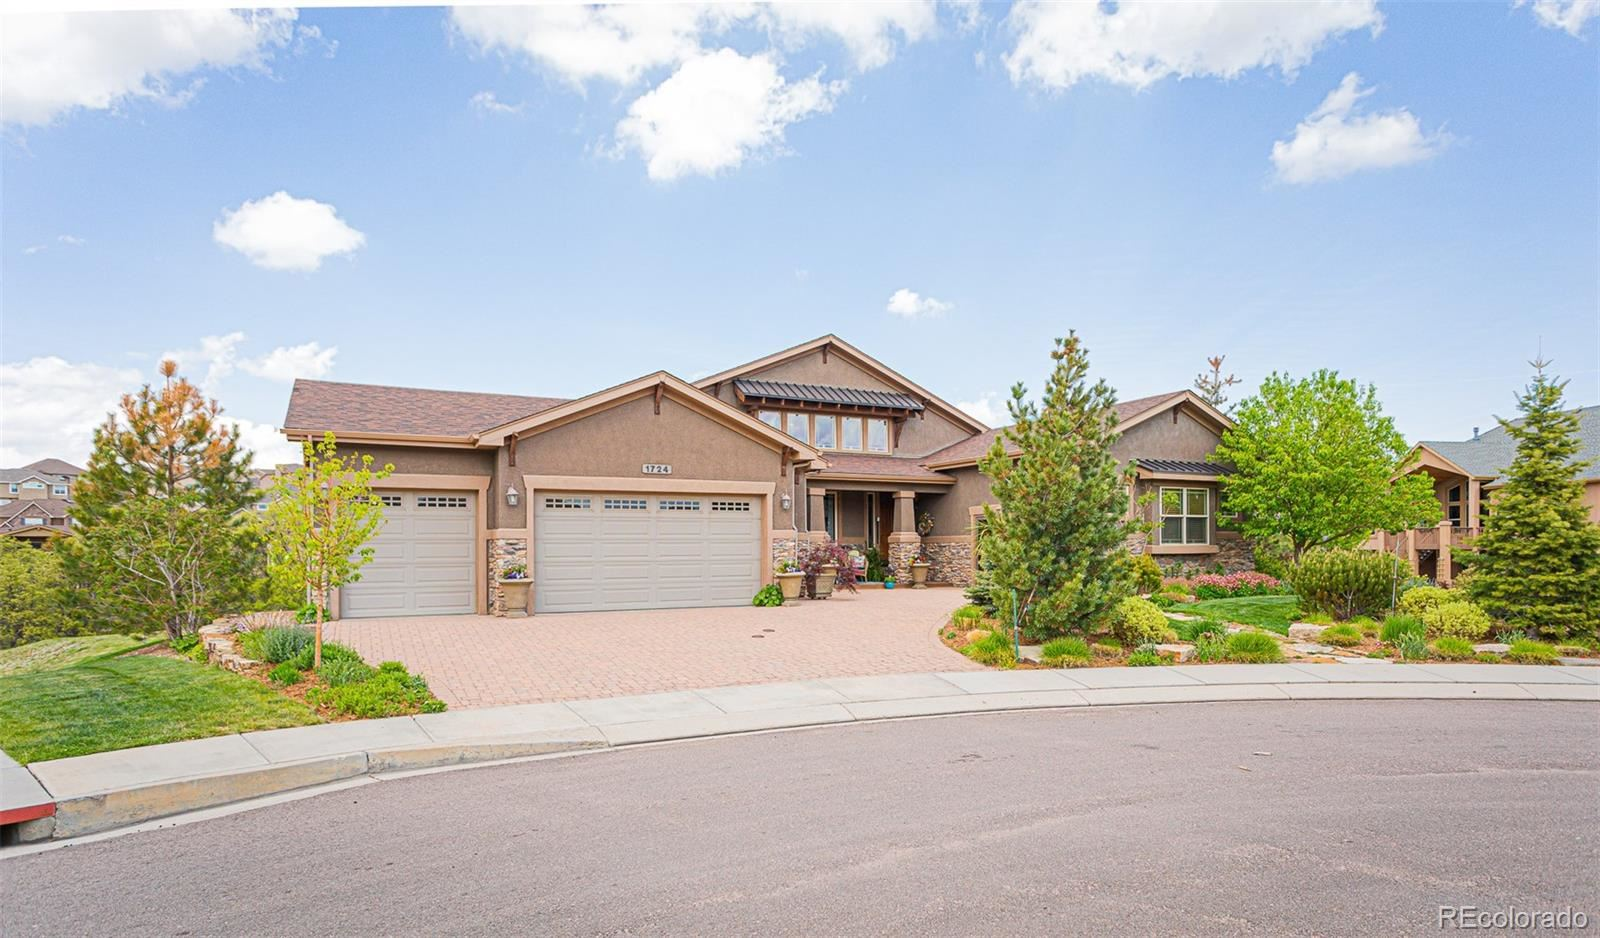 1724 Valley Stream Court, Colorado Springs, CO 80921 - #: 3123554